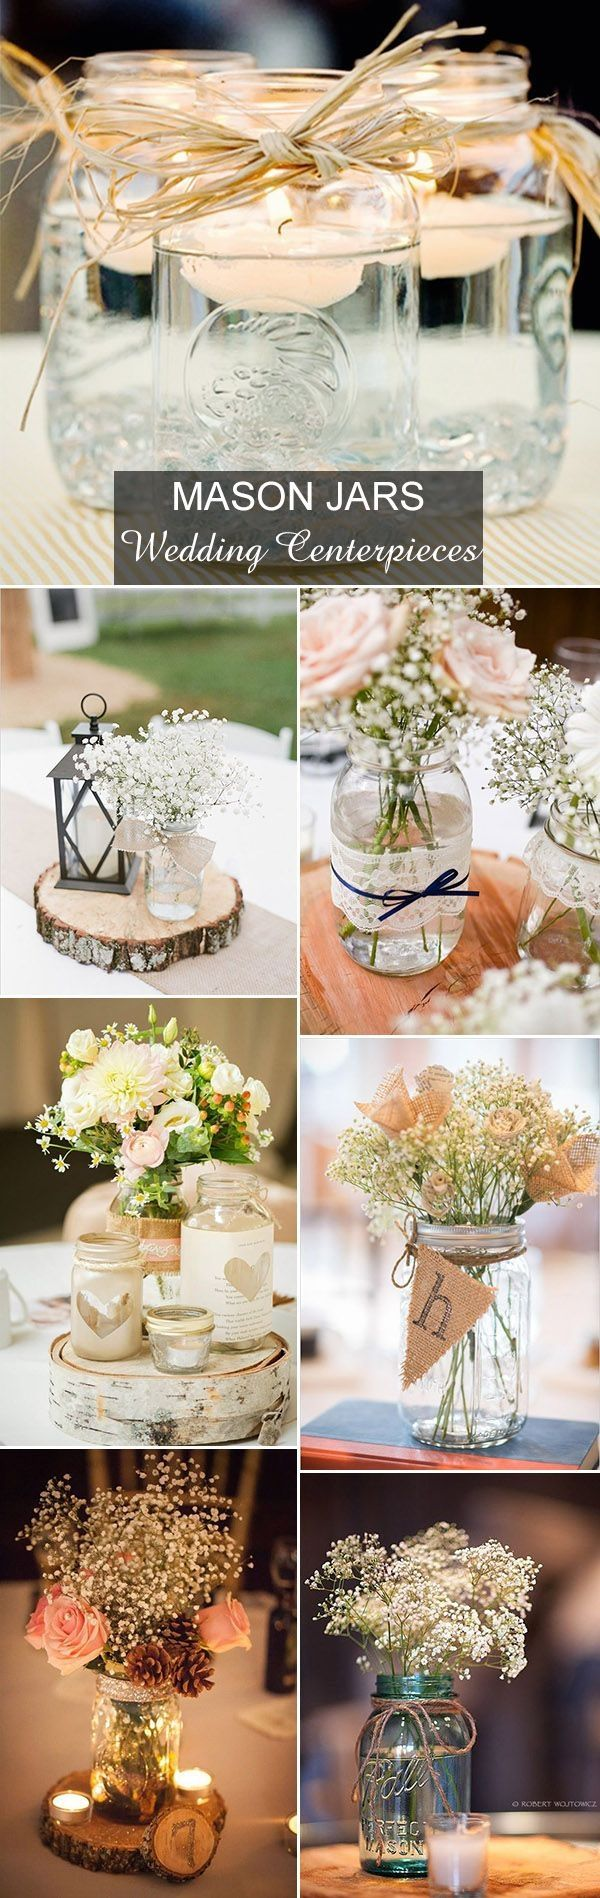 country rustic mason jars inspired wedding centerpieces ideas by Joanne Hewlett